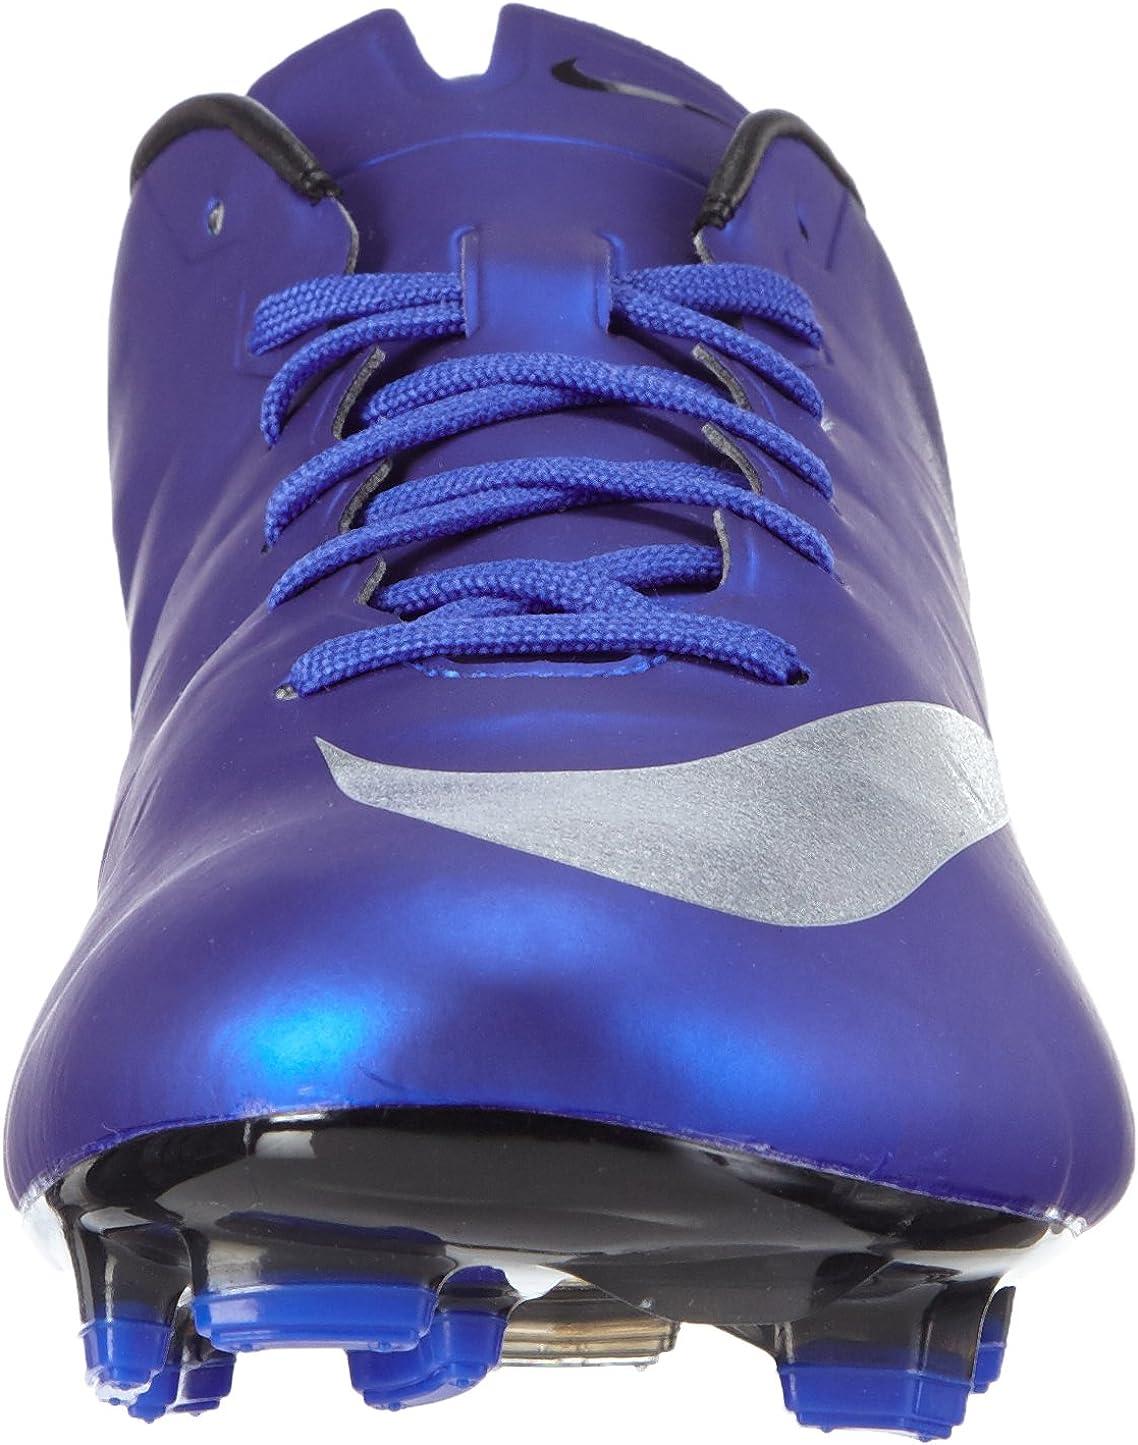 NIKE Mercurial Veloce II CR FG, Botas de fútbol para Hombre Azul Azul Dp Ryl Bl Mtllc Slvr Rcr Bl Bl